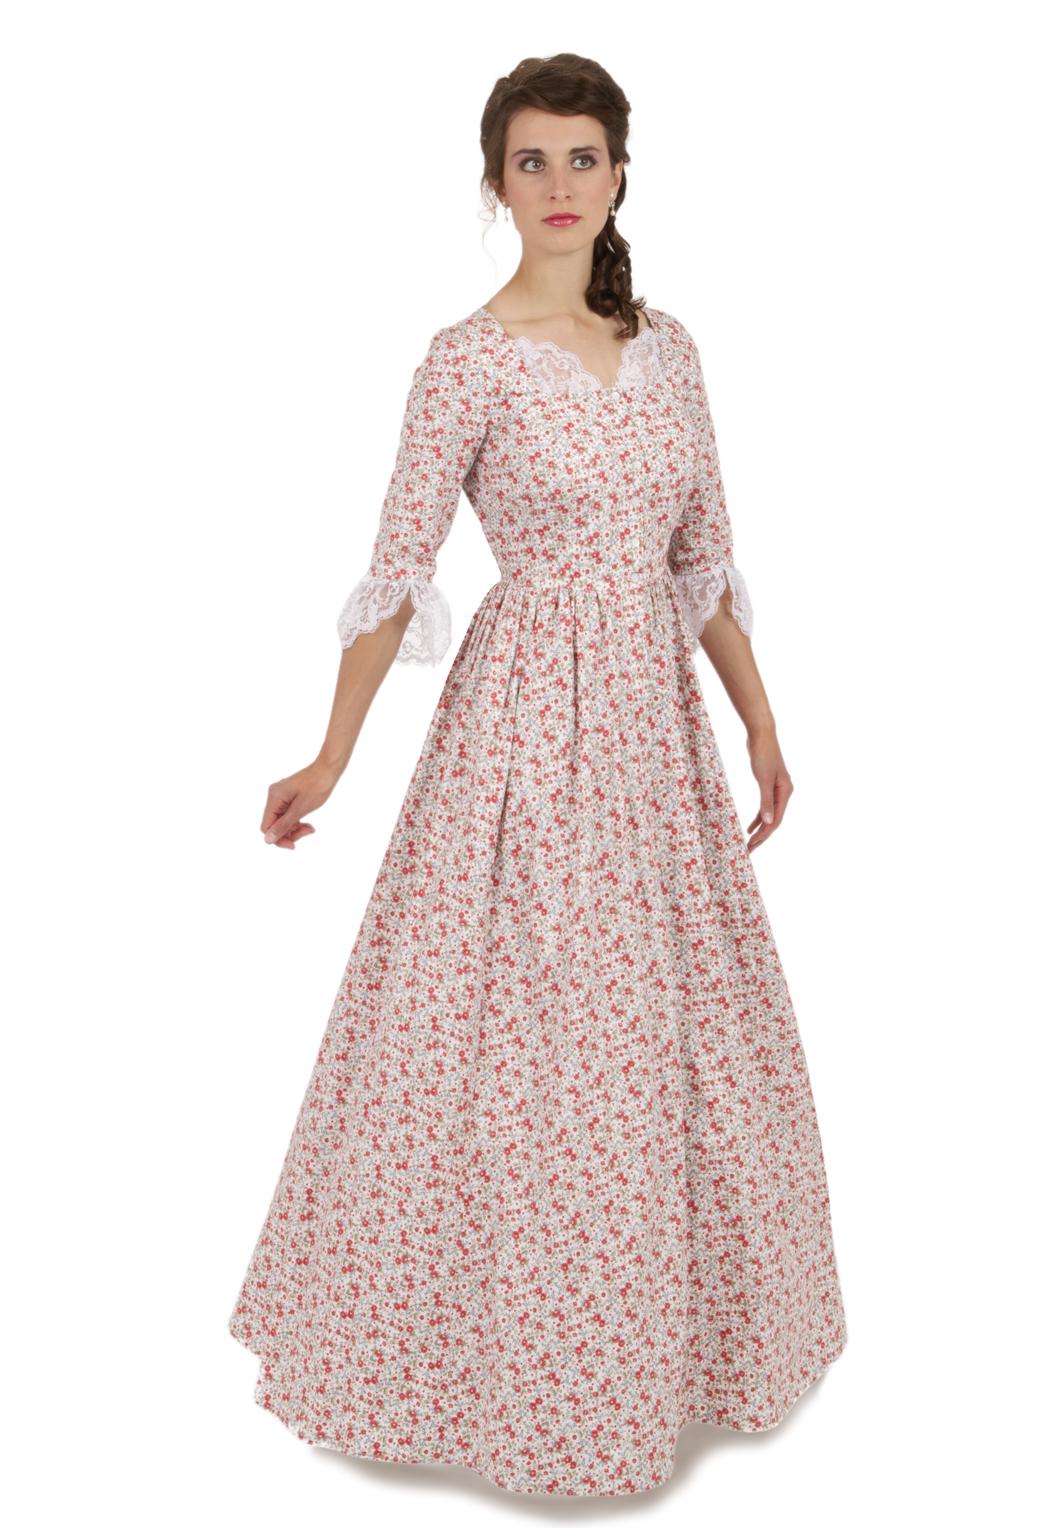 Fullsize Of Old Fashioned Dresses